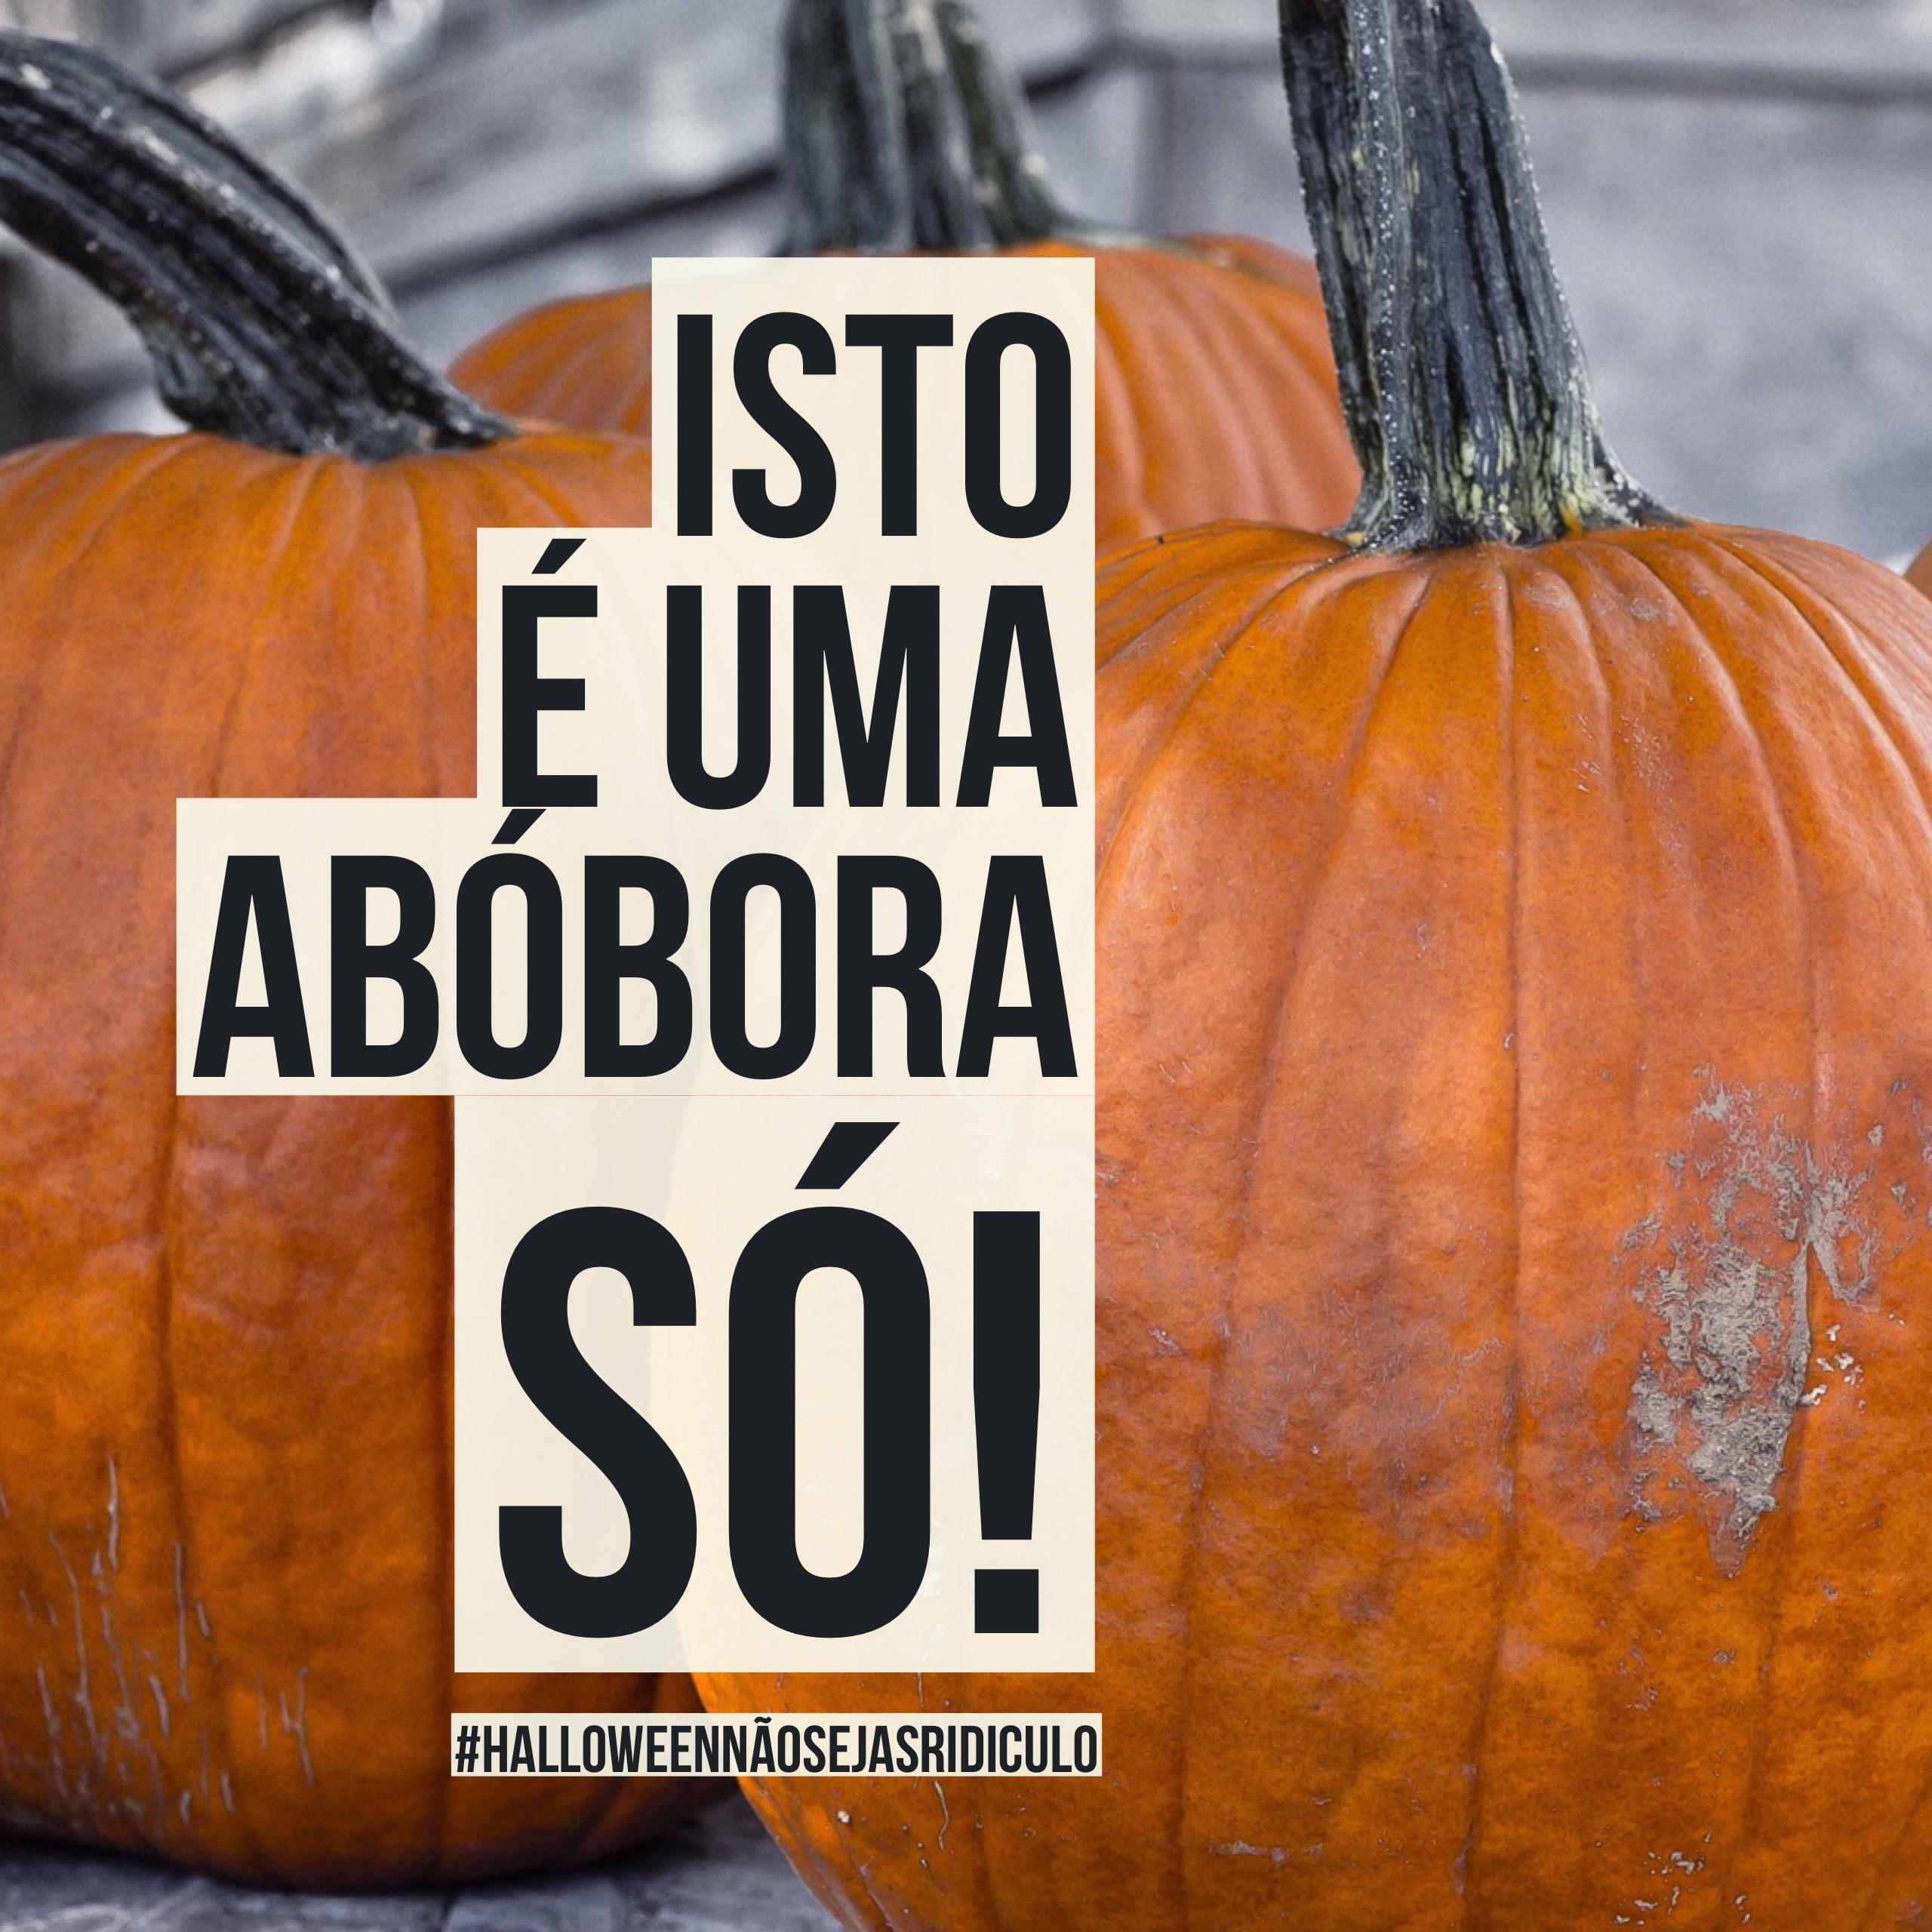 #Halloweennaosejasridiculo